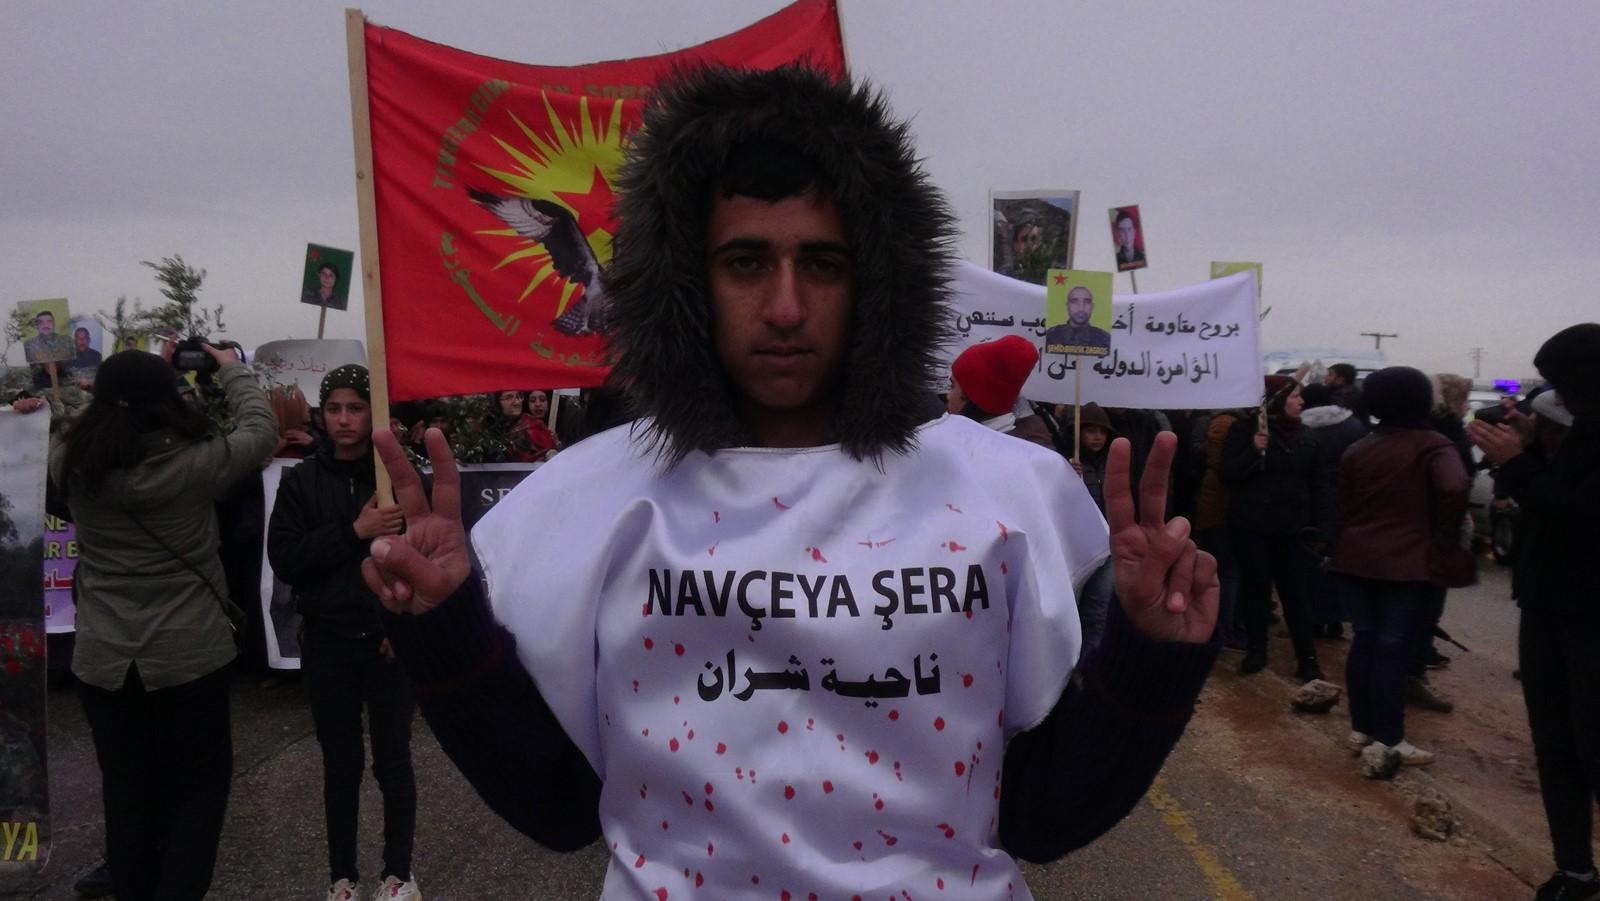 https://www.hawarnews.com/ar/uploads/files/2021/01/20/162841_abrahym-aly-5b1600x12005d.jpg